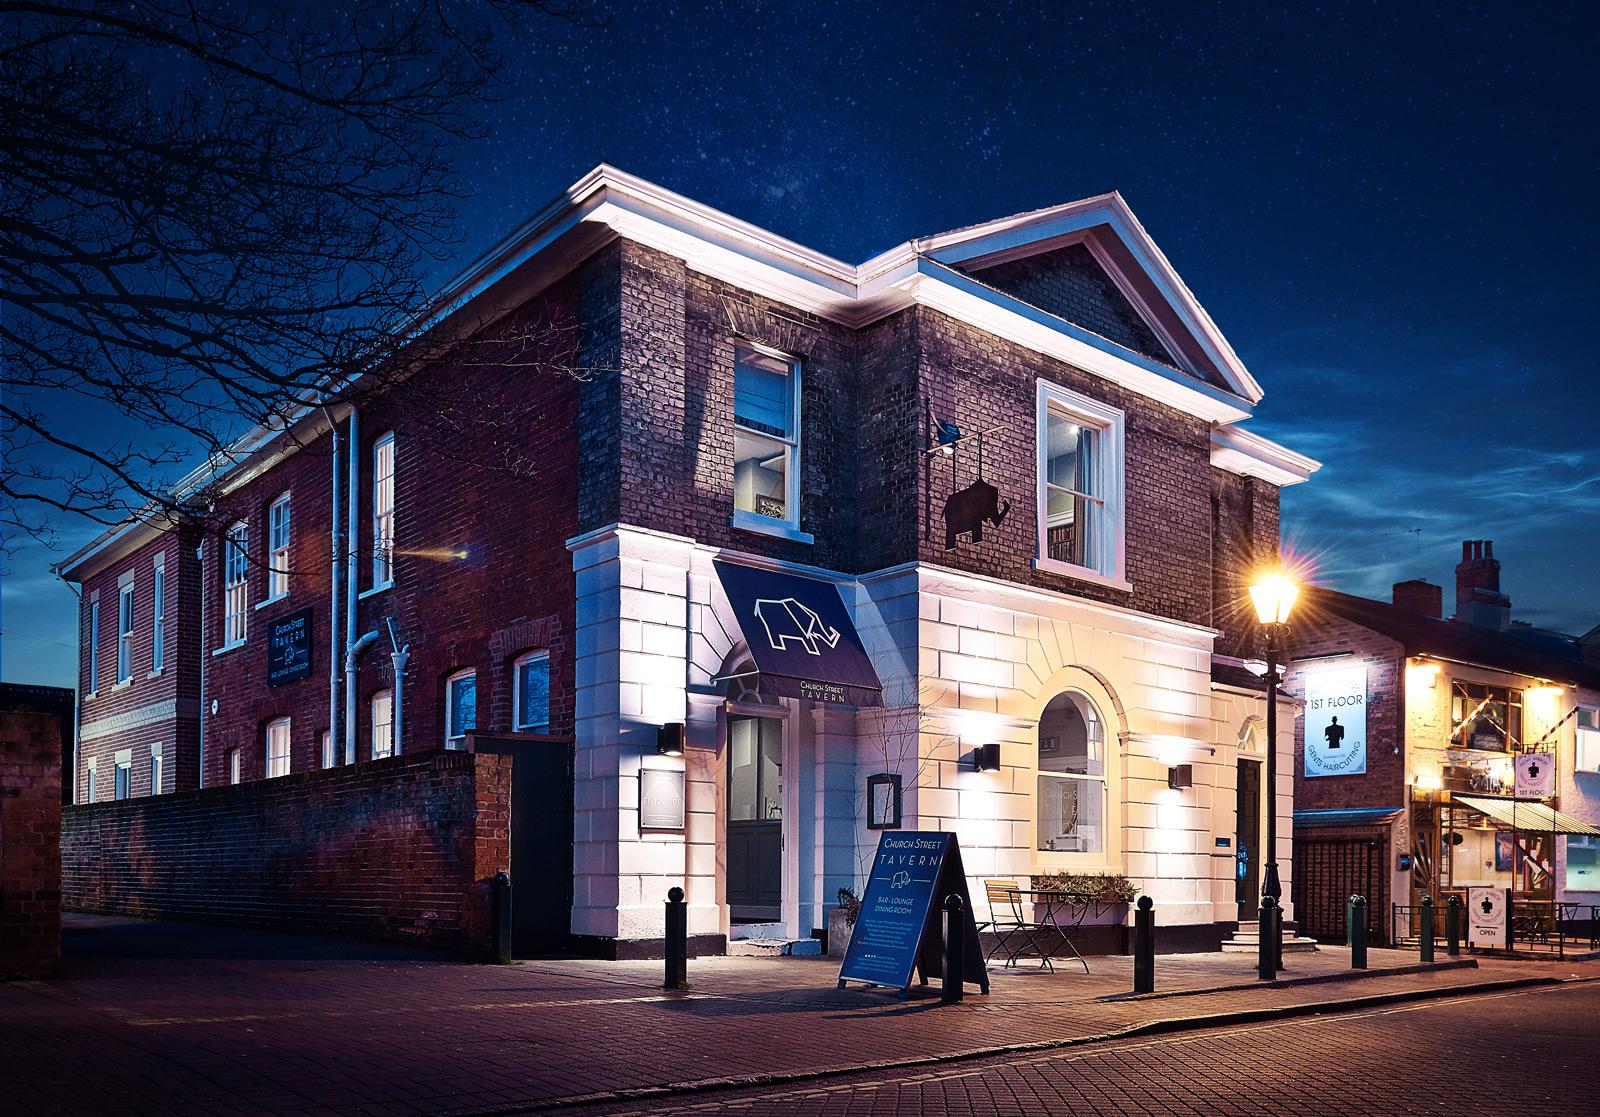 Church Street Tavern restaurant and bar at night